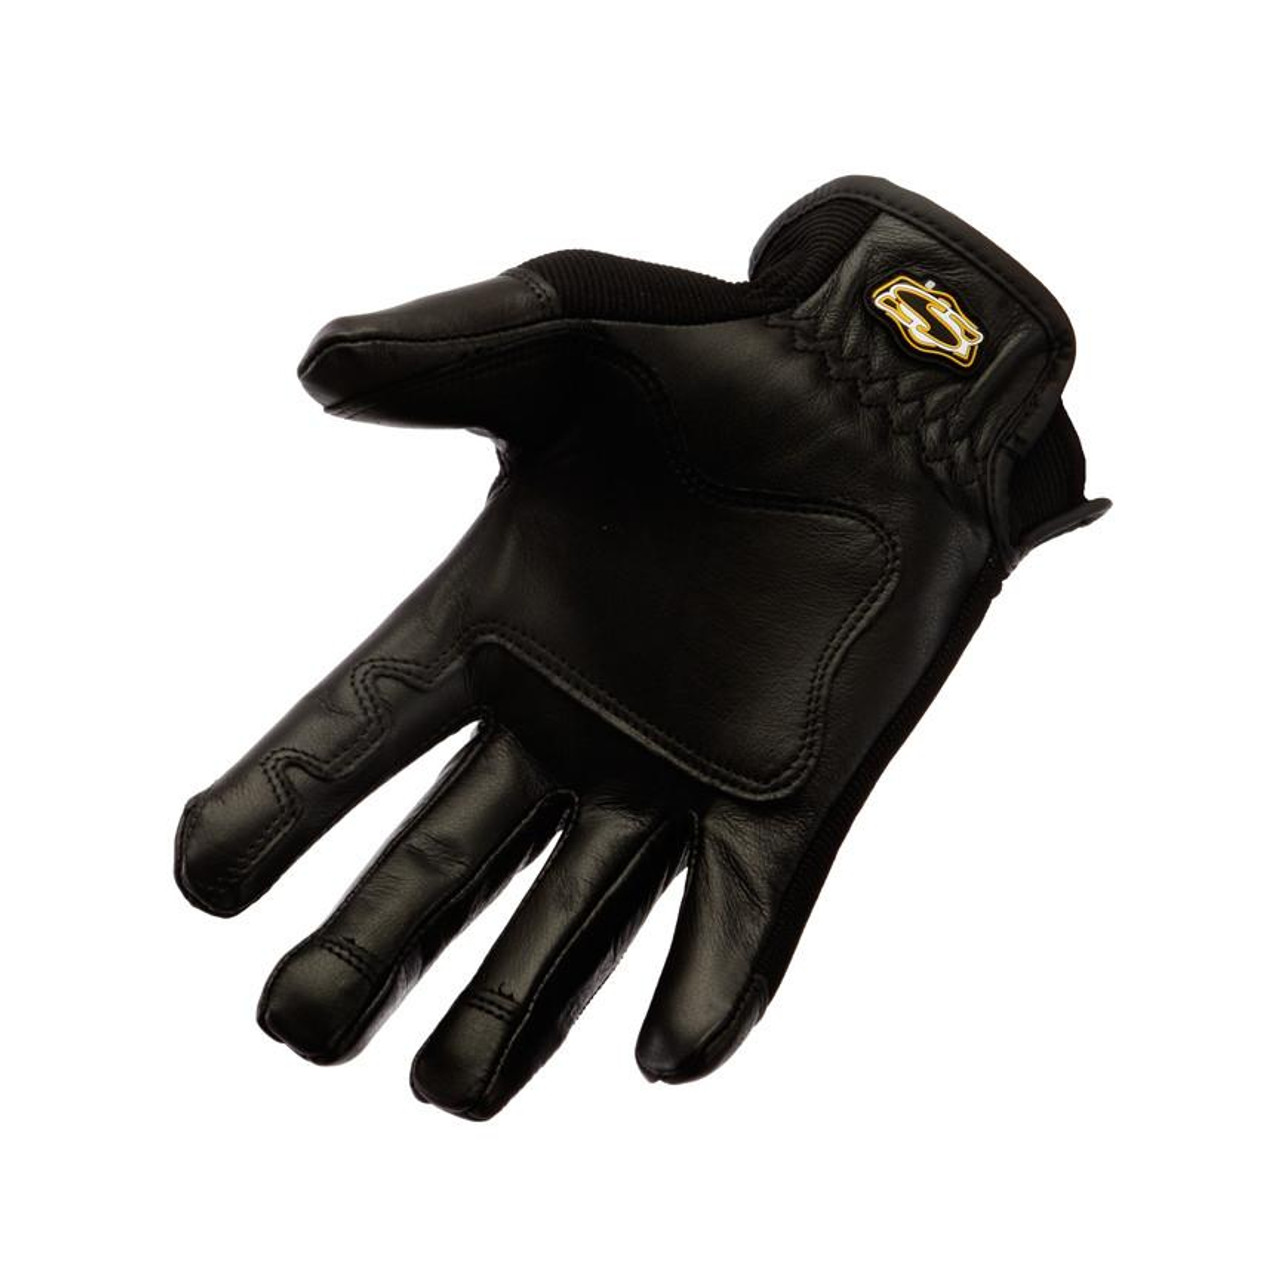 Setwear Pro Glove Black